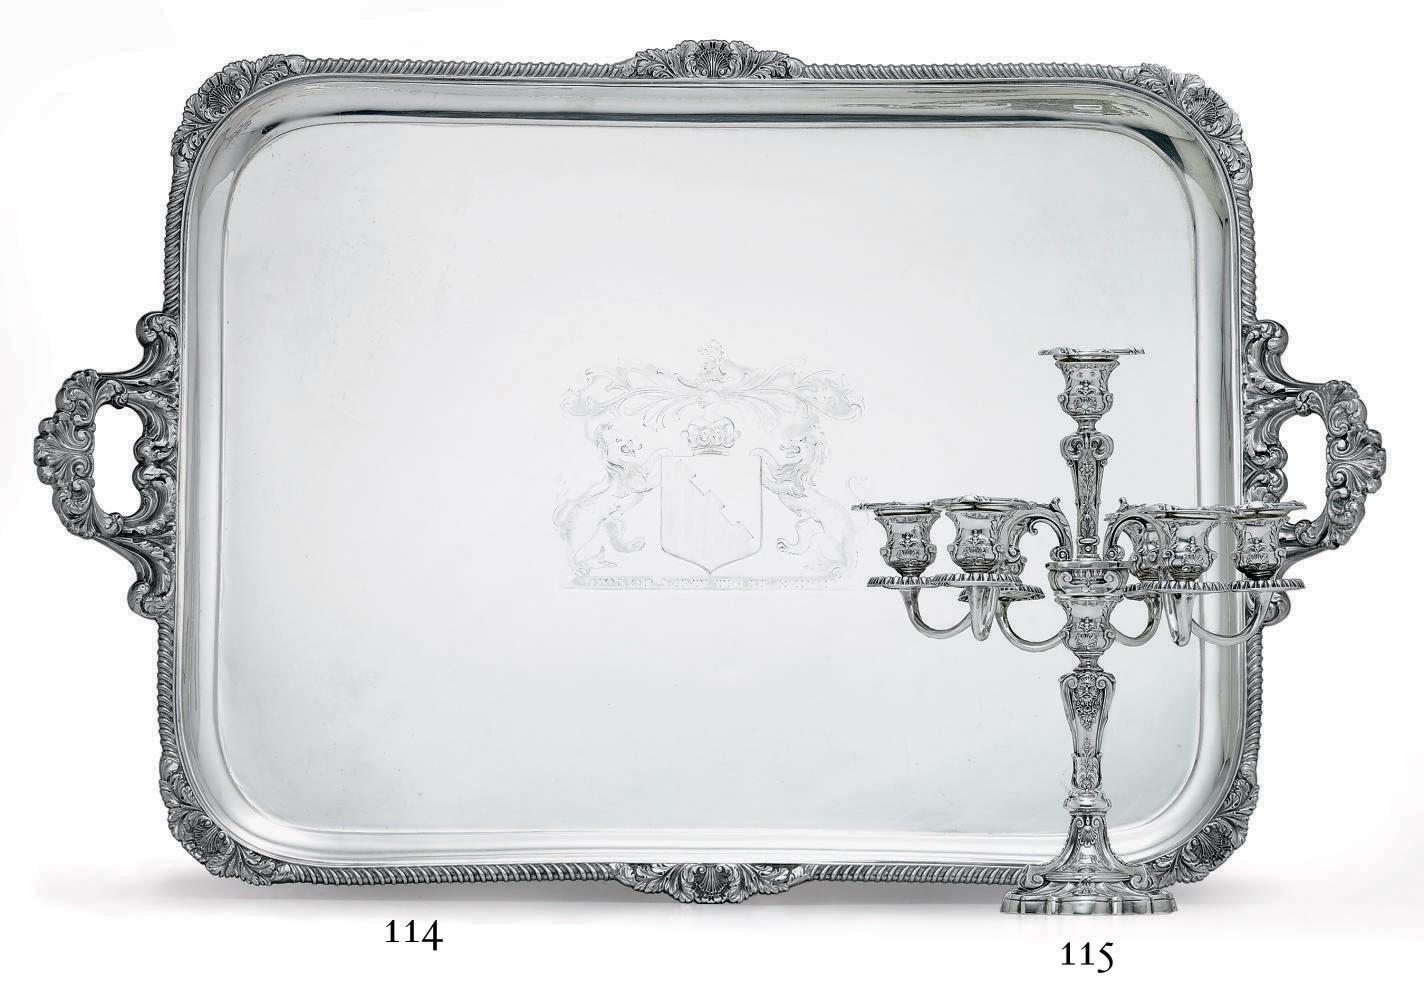 AN EDWARD VII SILVER TWO-HANDLED TEA TRAY